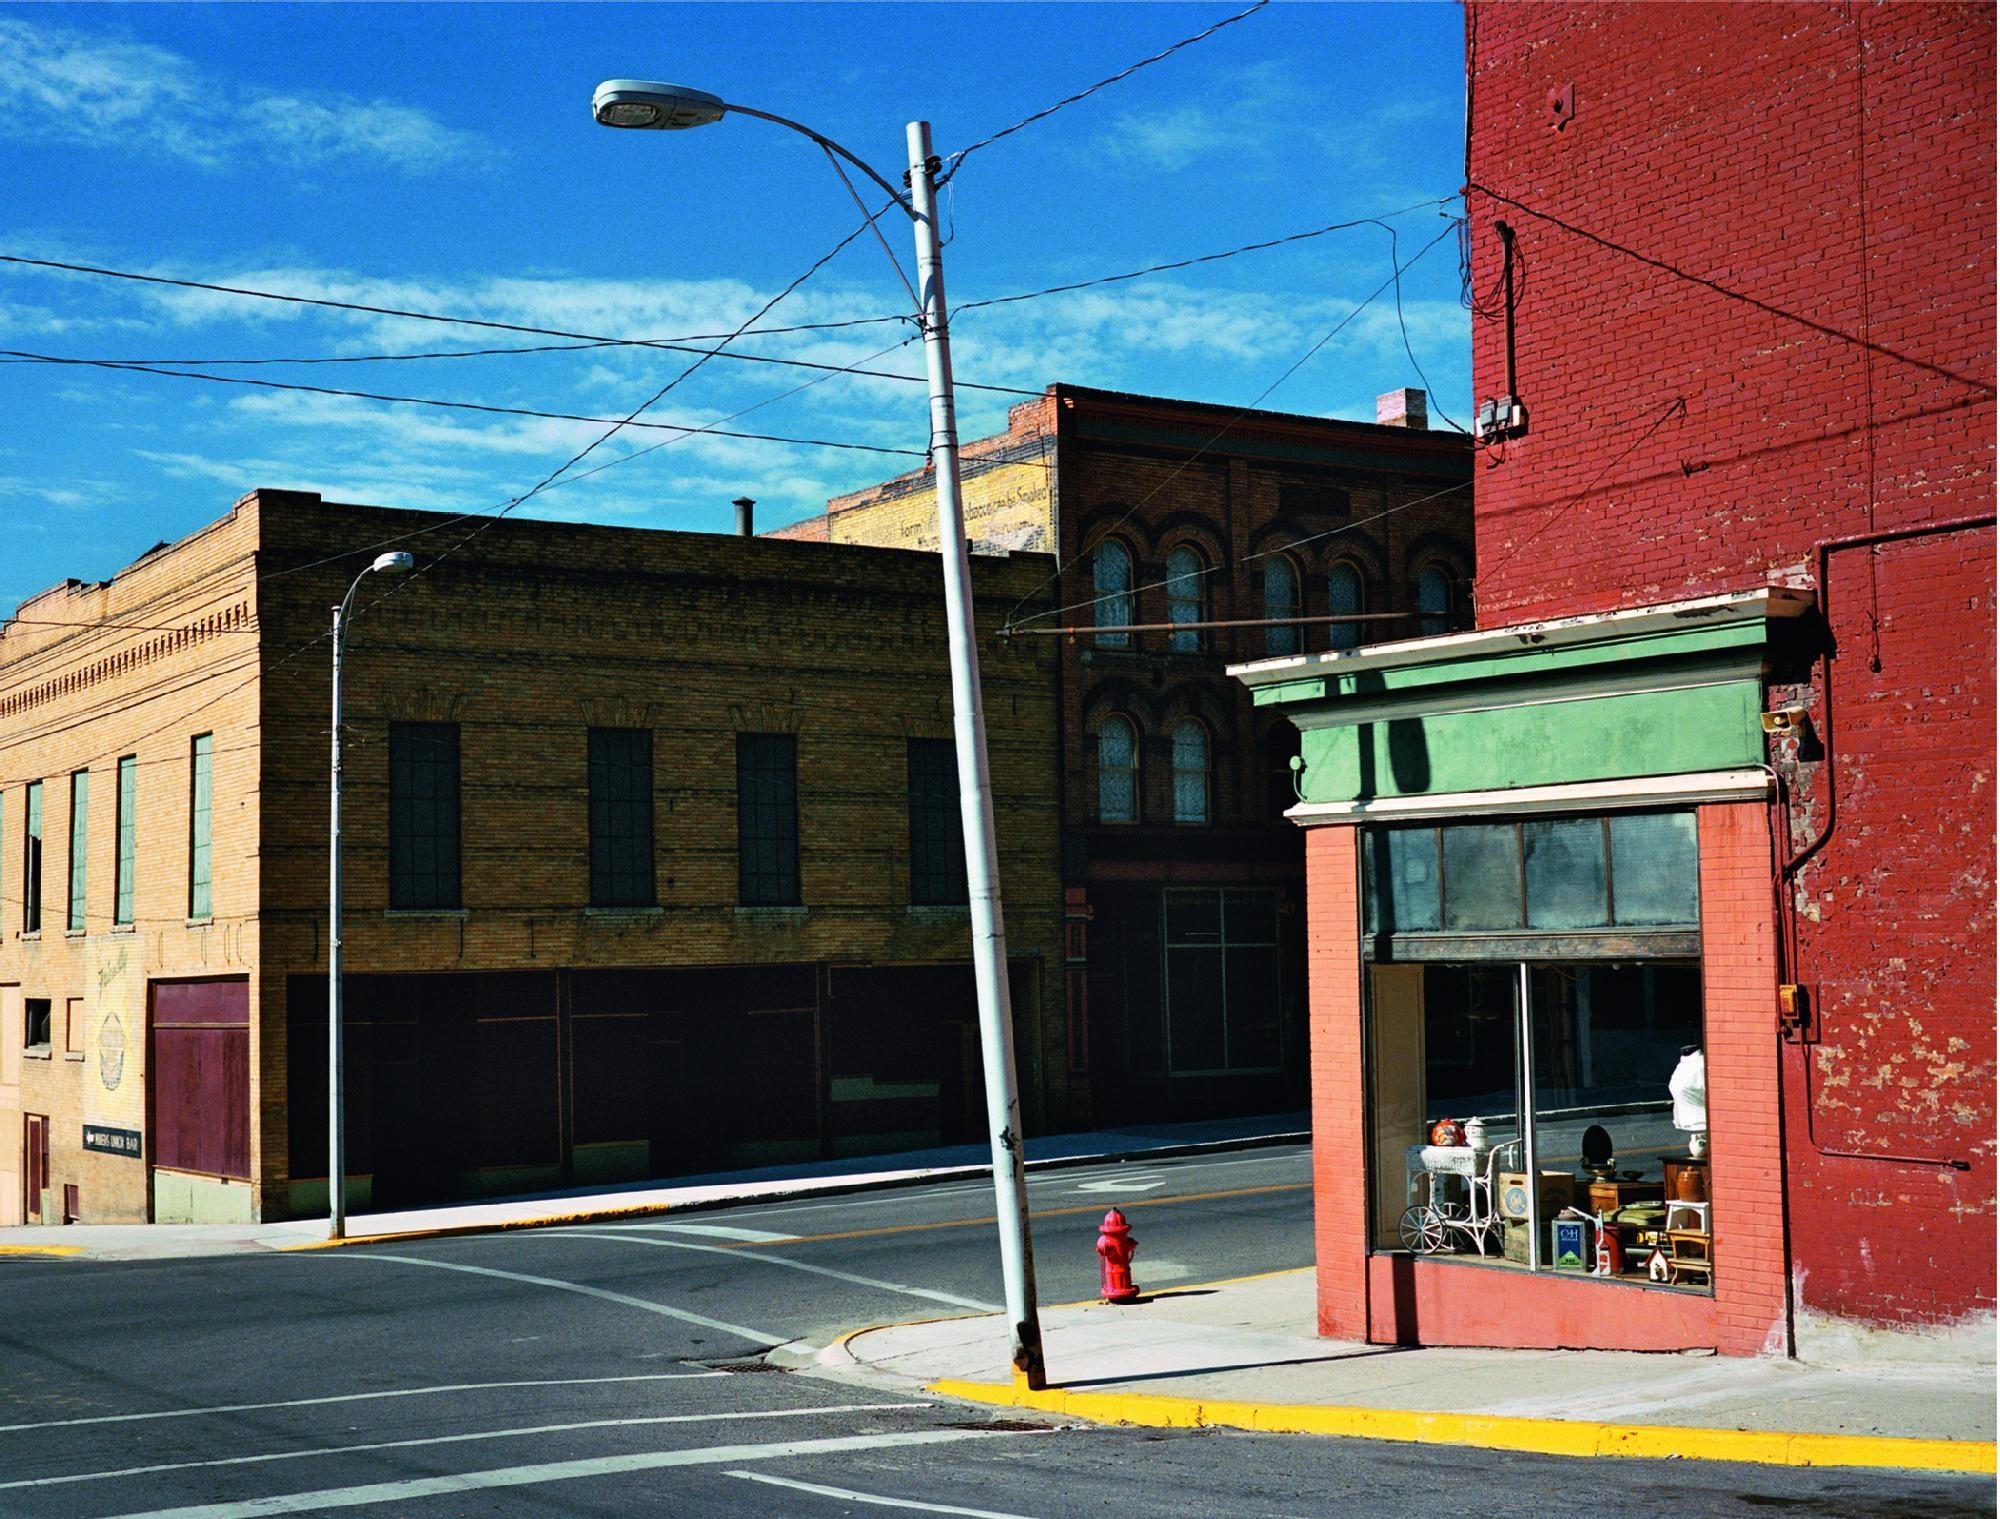 Wim Wenders Streetcorner in Butte